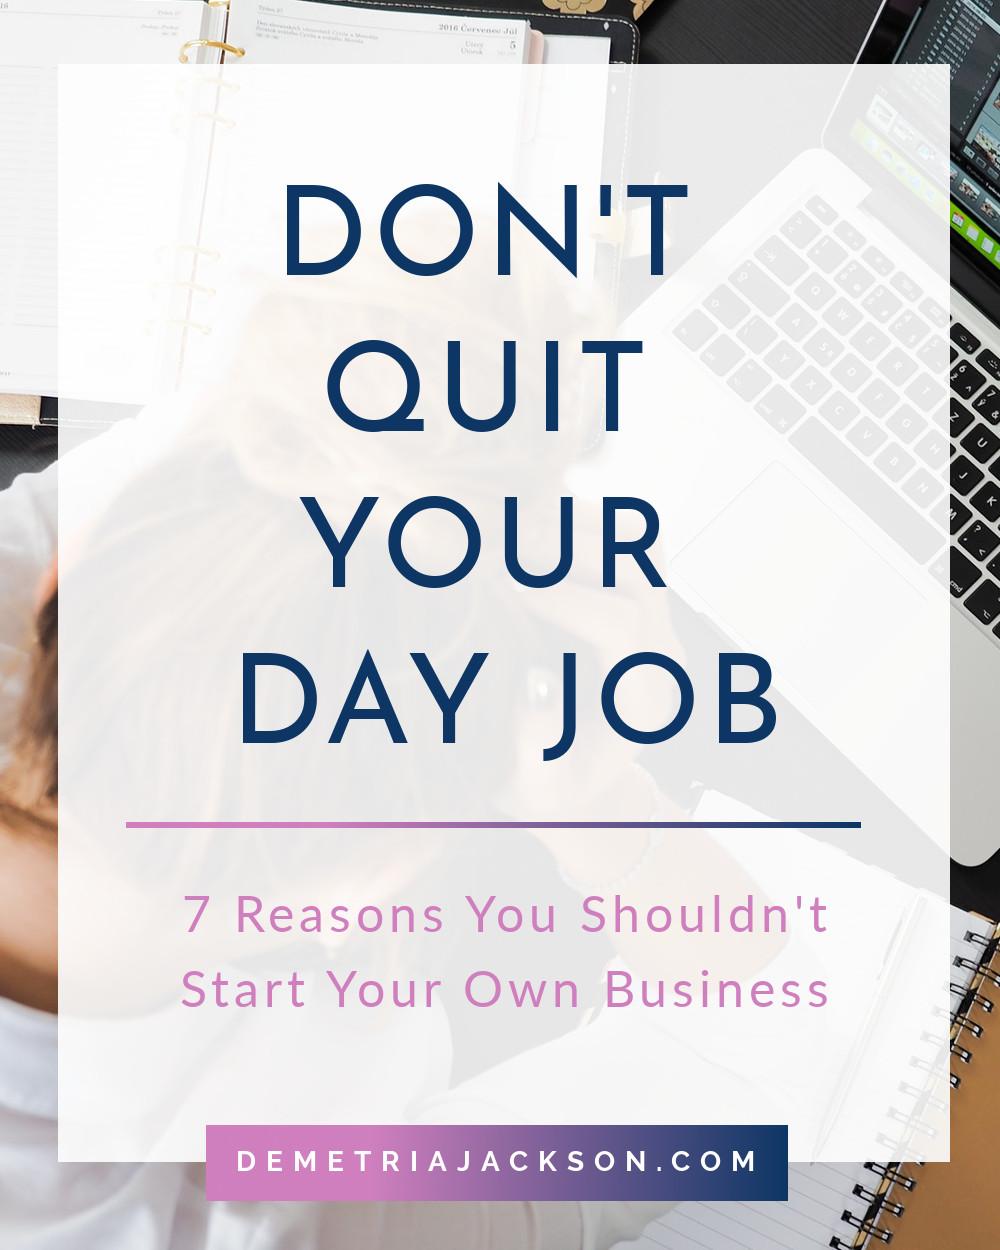 blog-image-7-reasons-you-shouldnt-start-a-business.jpeg